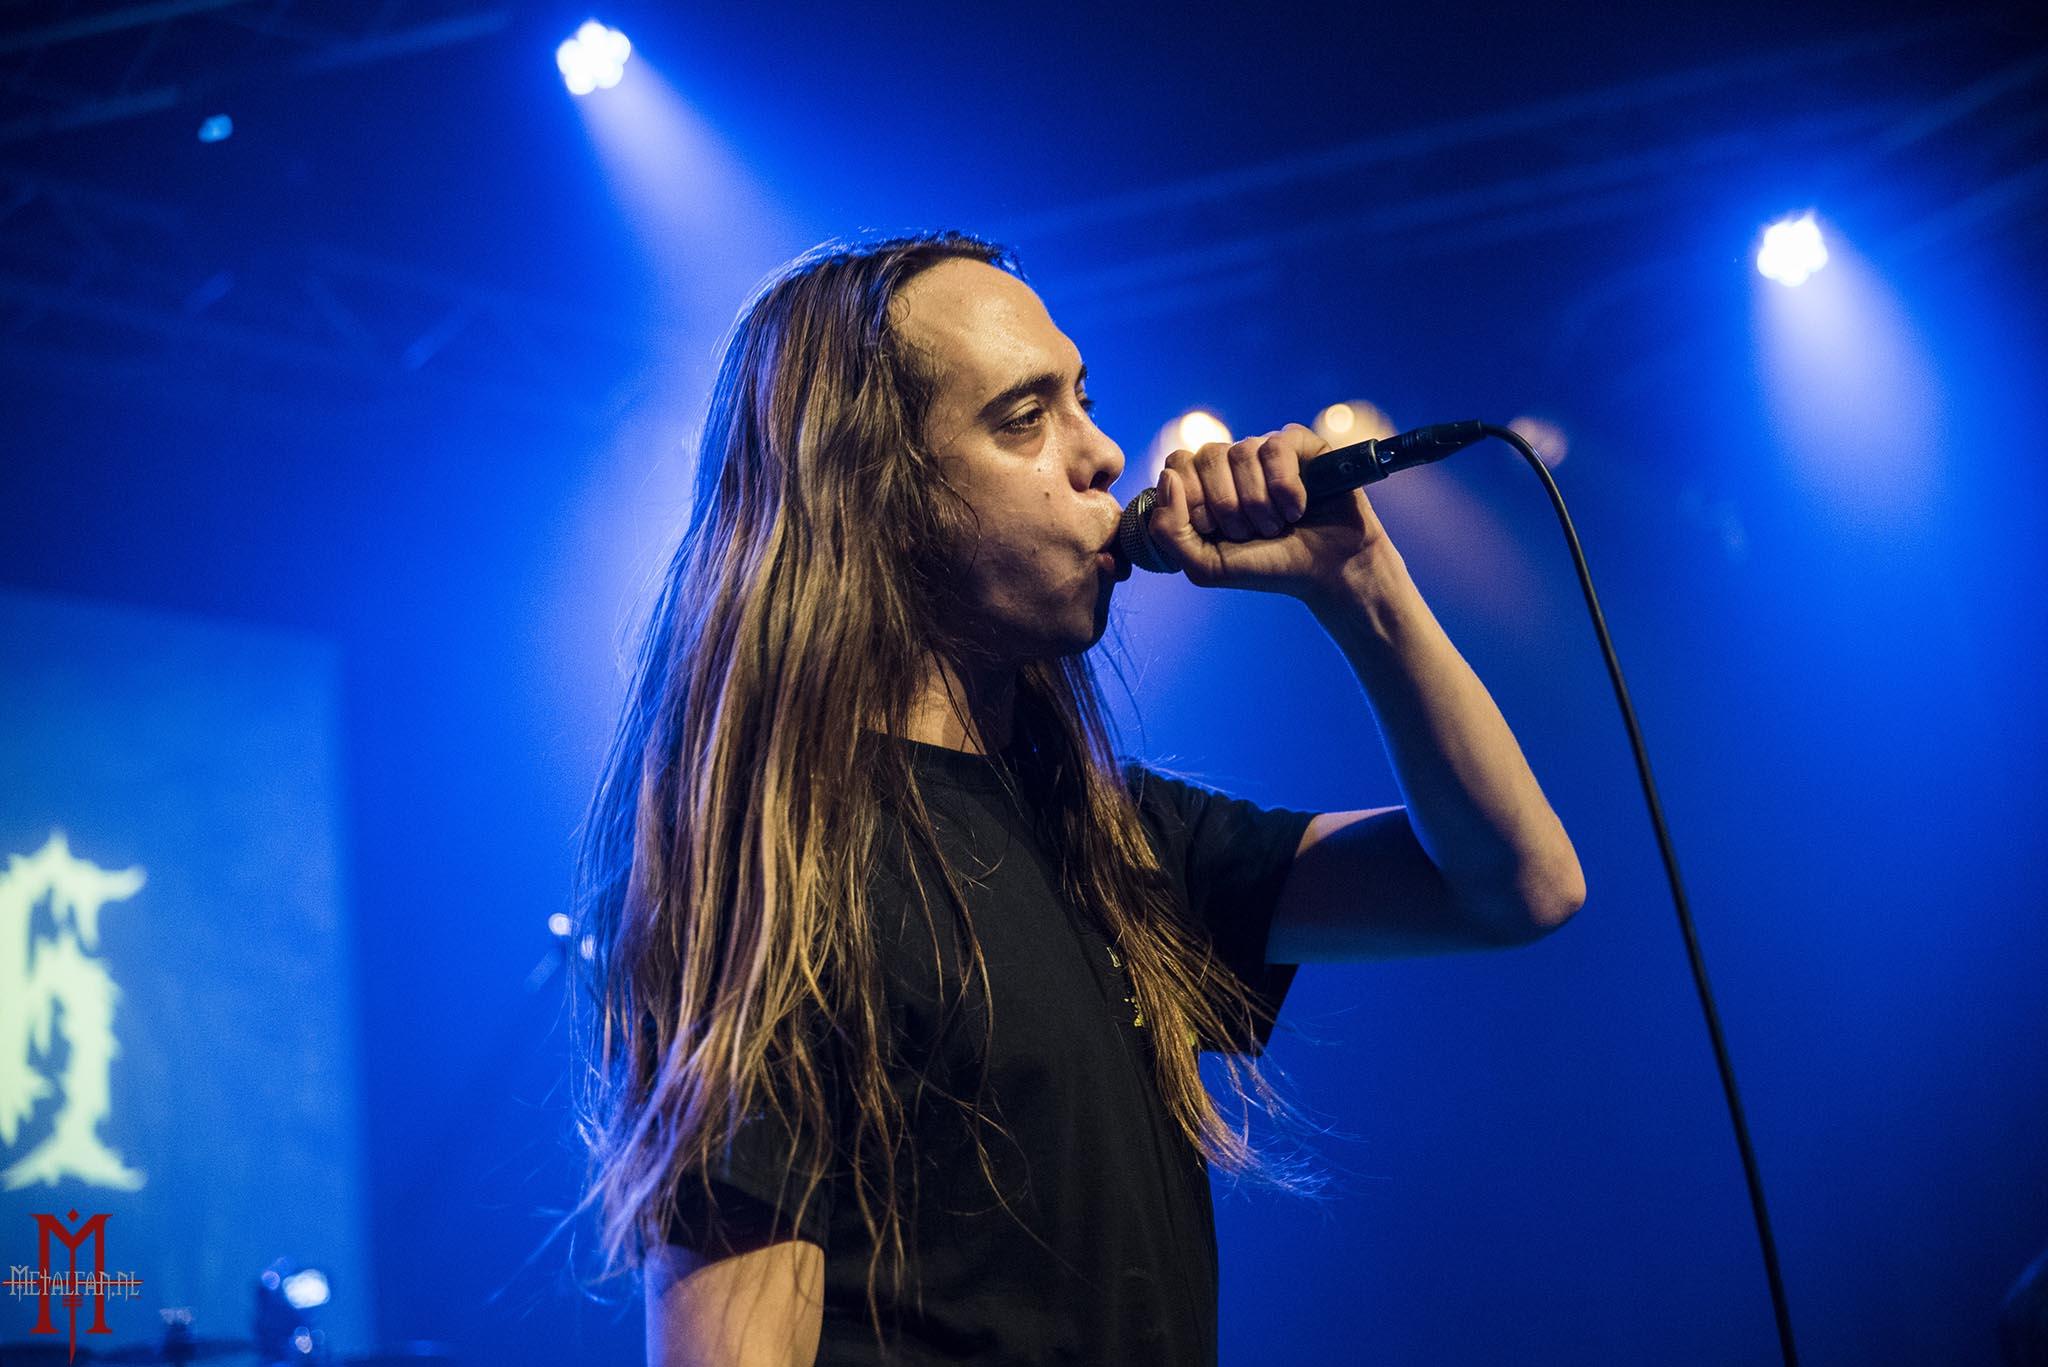 Sepiroth @ Bruut Metalfeest 5, 10-12-2016